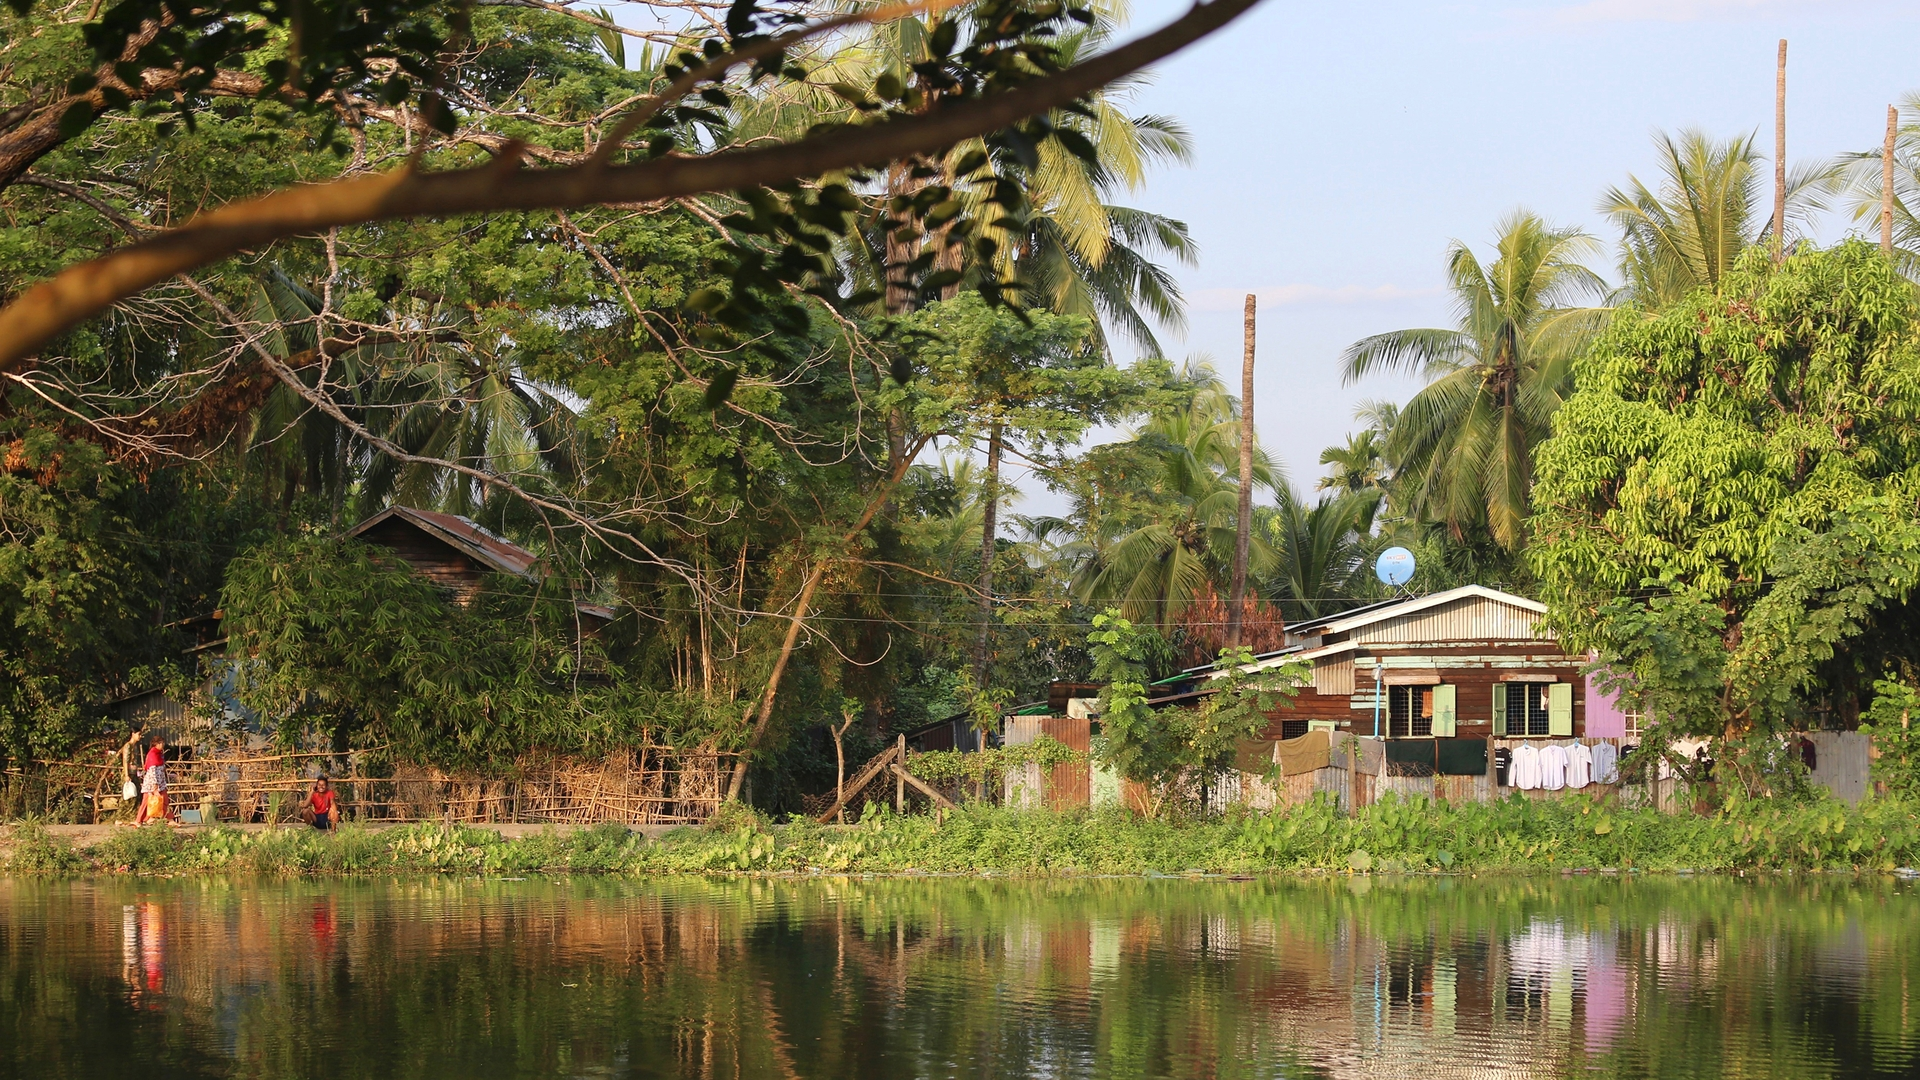 Enlarge Photo: Existing landscape conditions within Yangon's Dala Township / Scott Melbourne